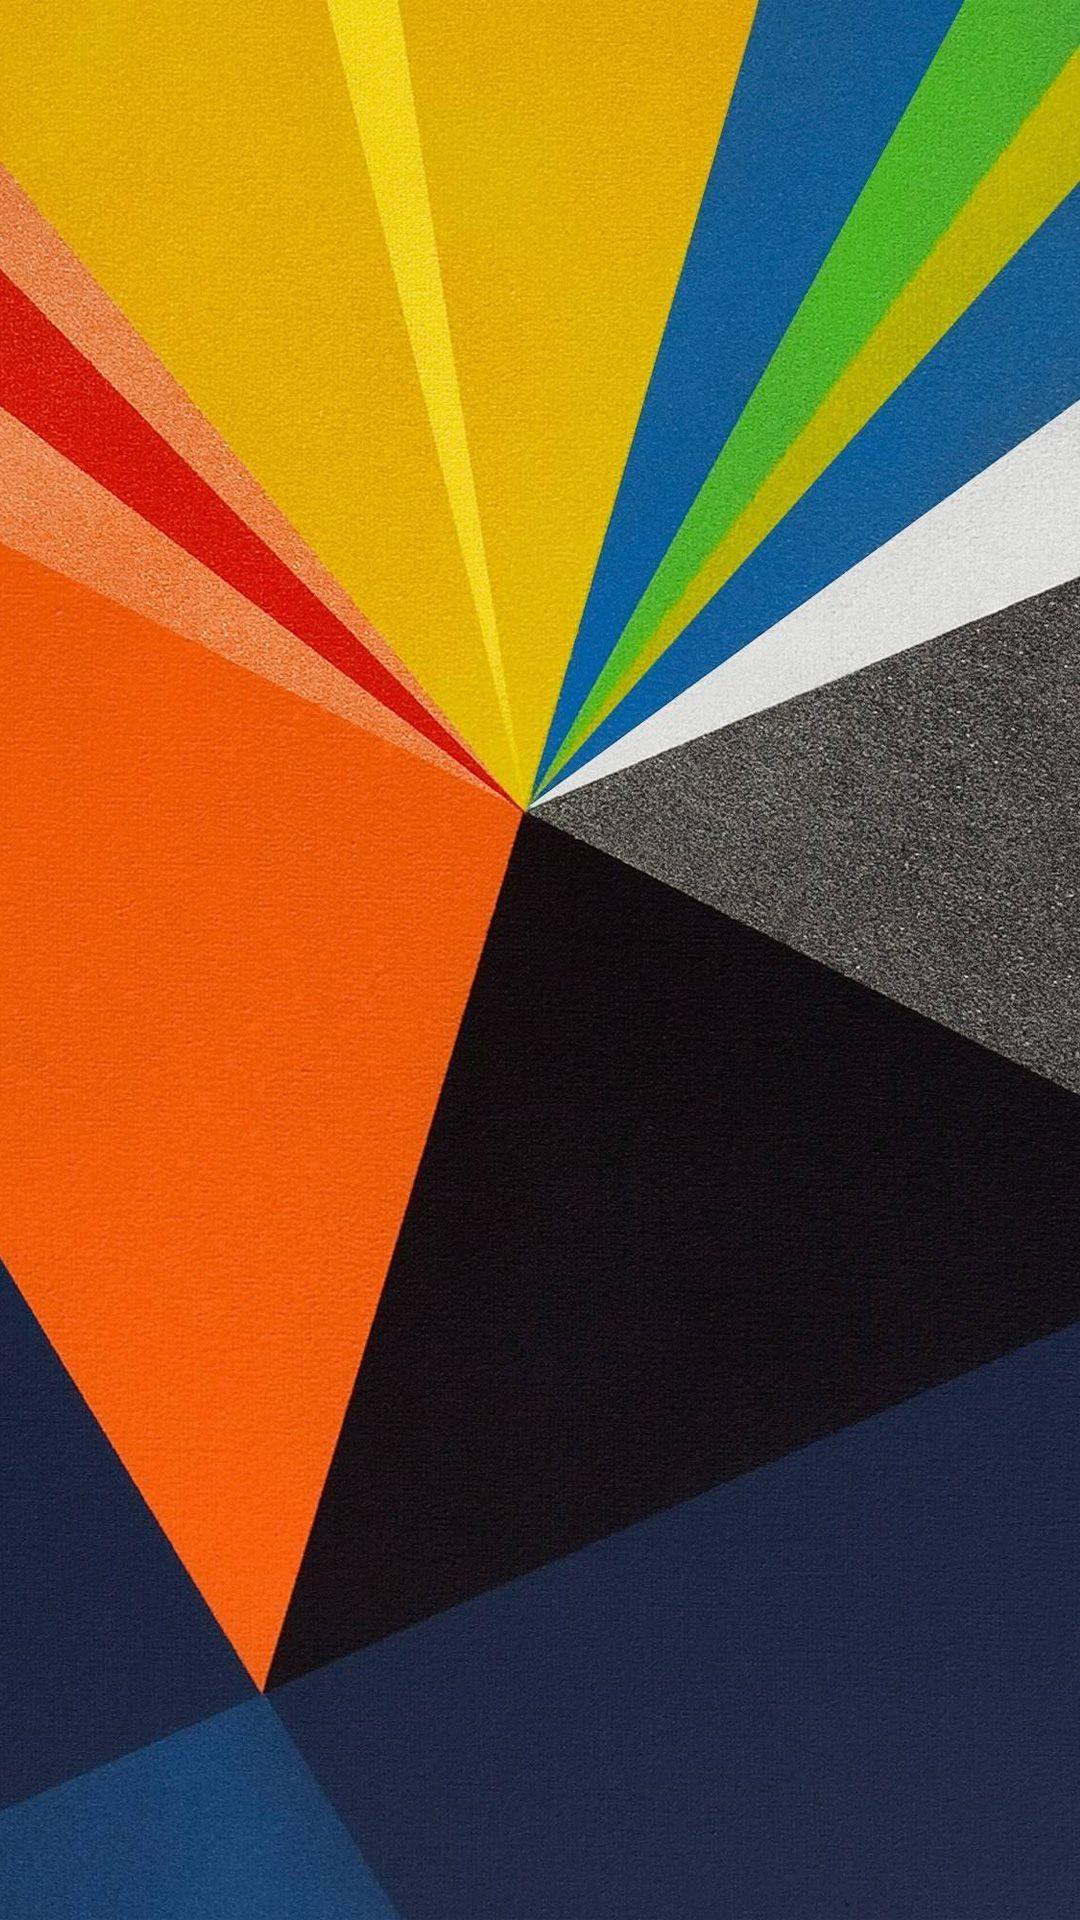 abstract wallpaper   iphone wallpaper